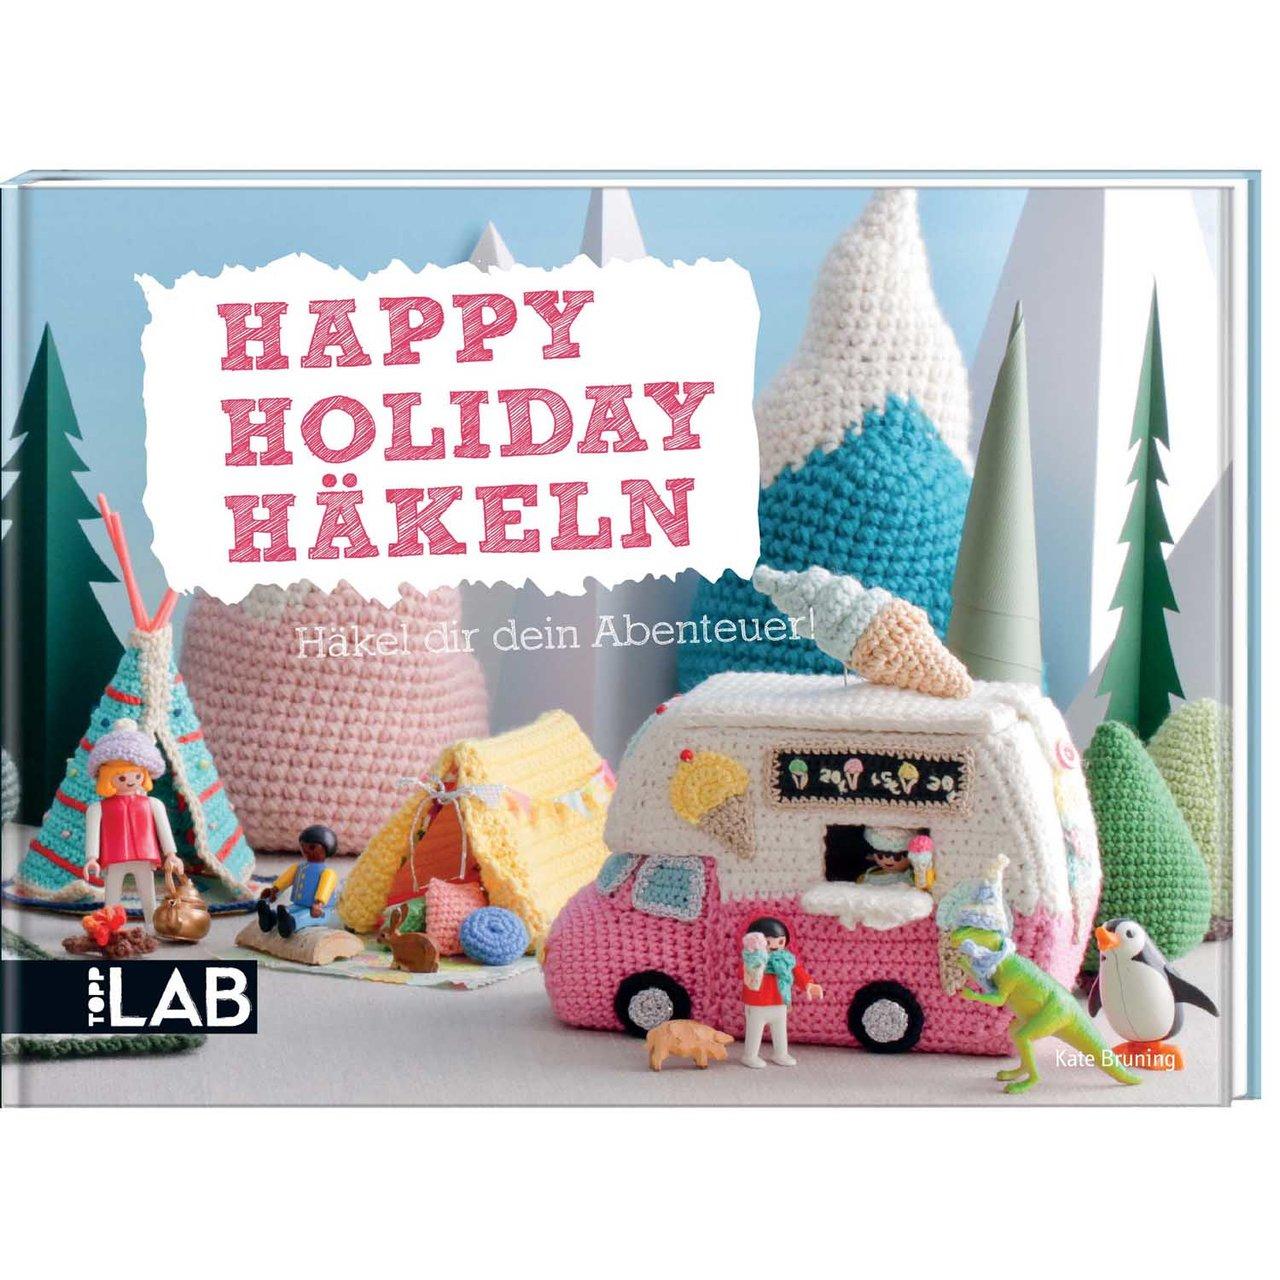 TOPP Happy Holiday Häkeln - Häkel dir dein Aben...